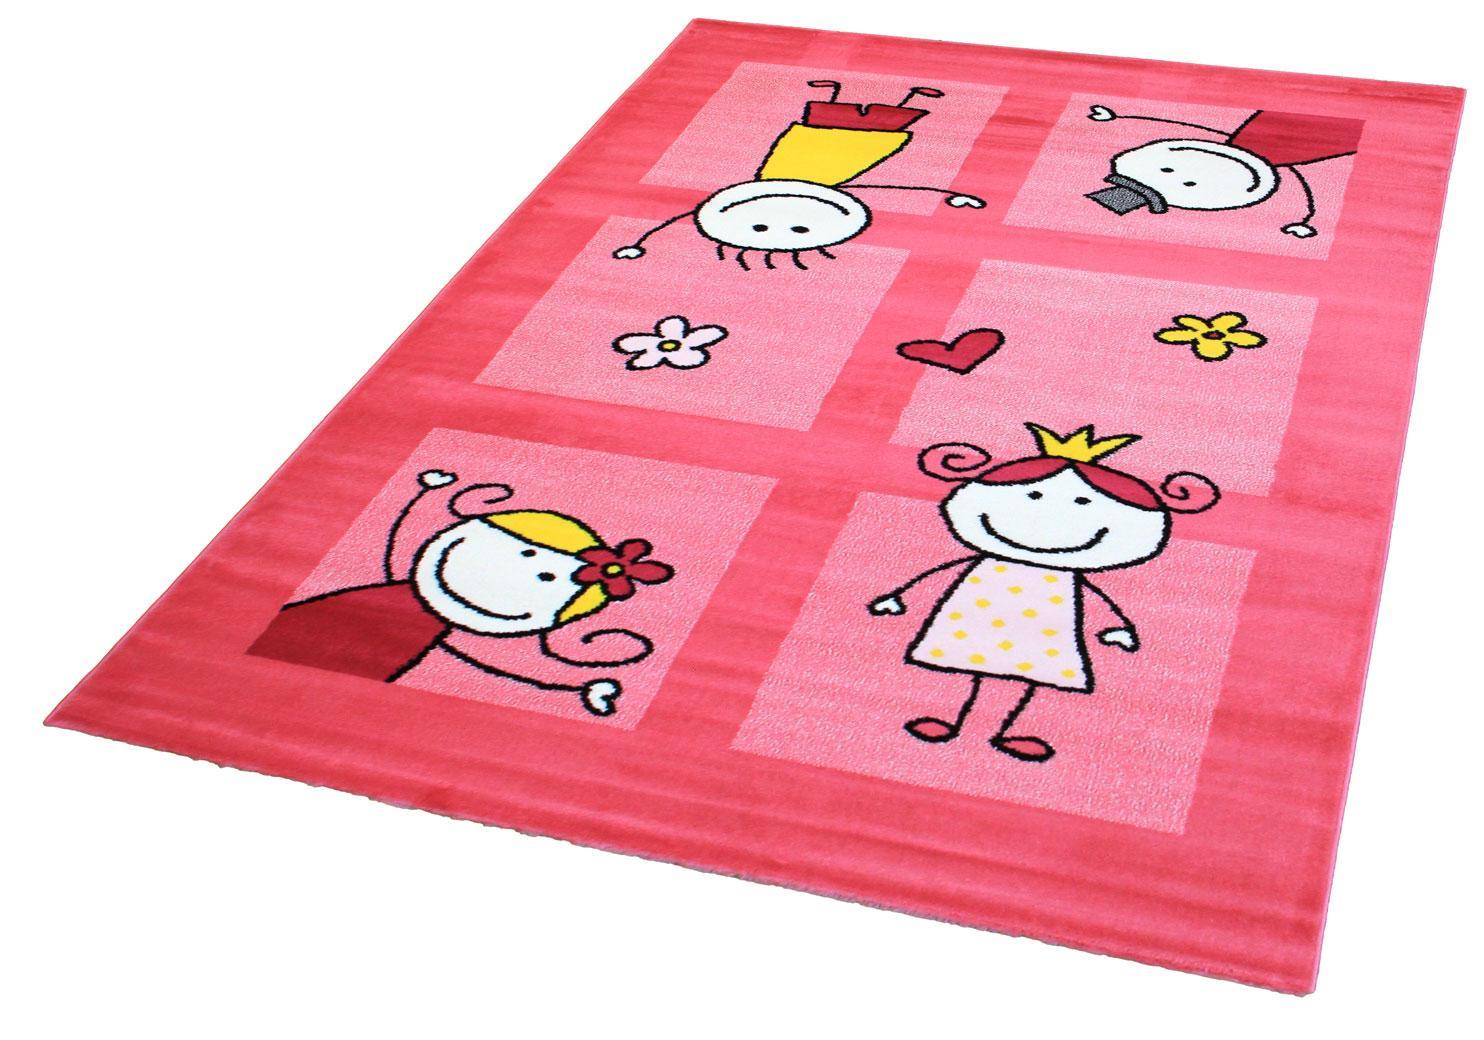 Kinderteppich Bambino 2107 Sanat Teppiche rechteckig Höhe 11 mm